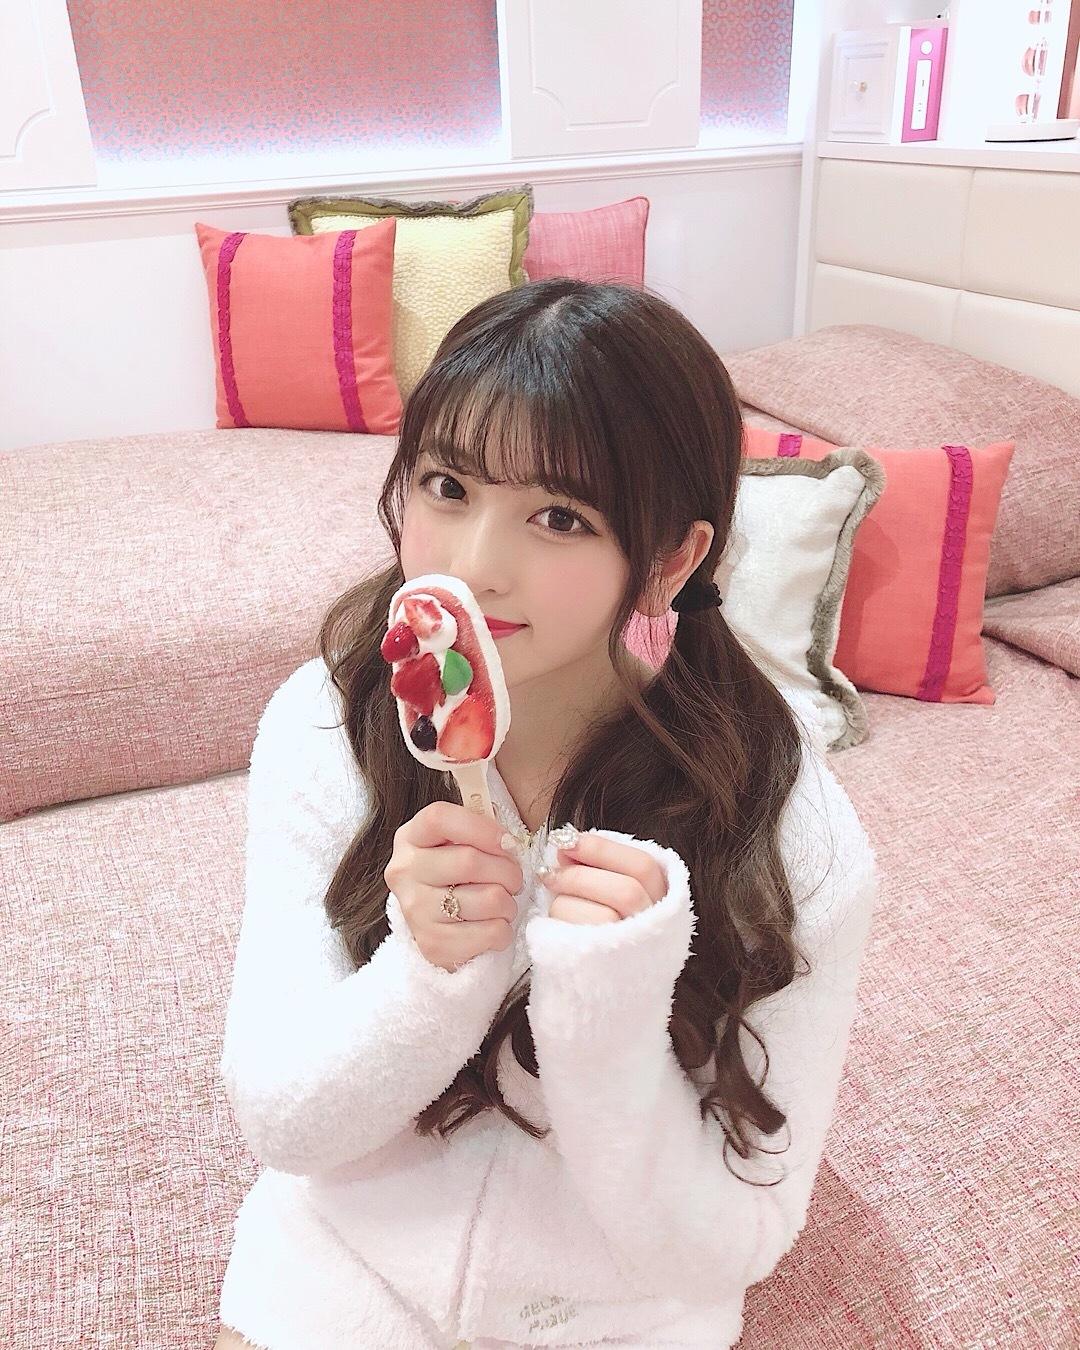 【JILL STUART】girly全開なピンクのホテル♥_1_16